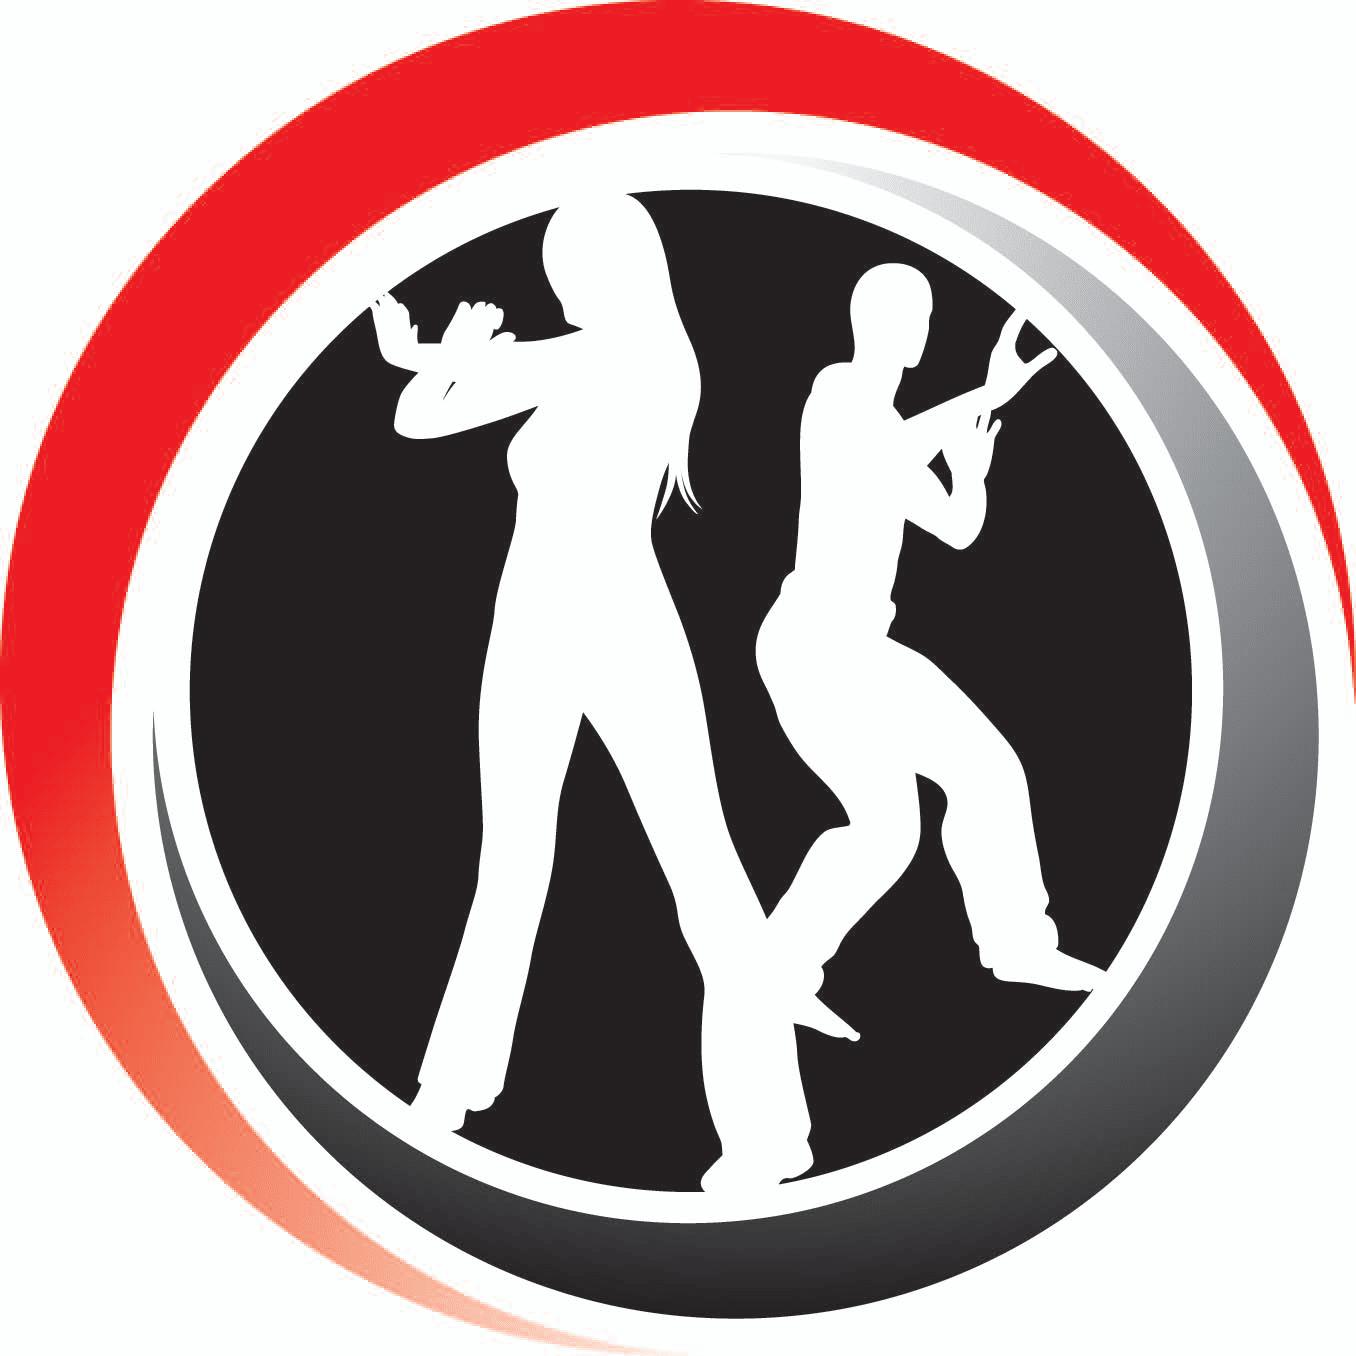 Martial Arts & Fitness - Birmingham, West Midlands B12 9RG - 08007 720781 | ShowMeLocal.com